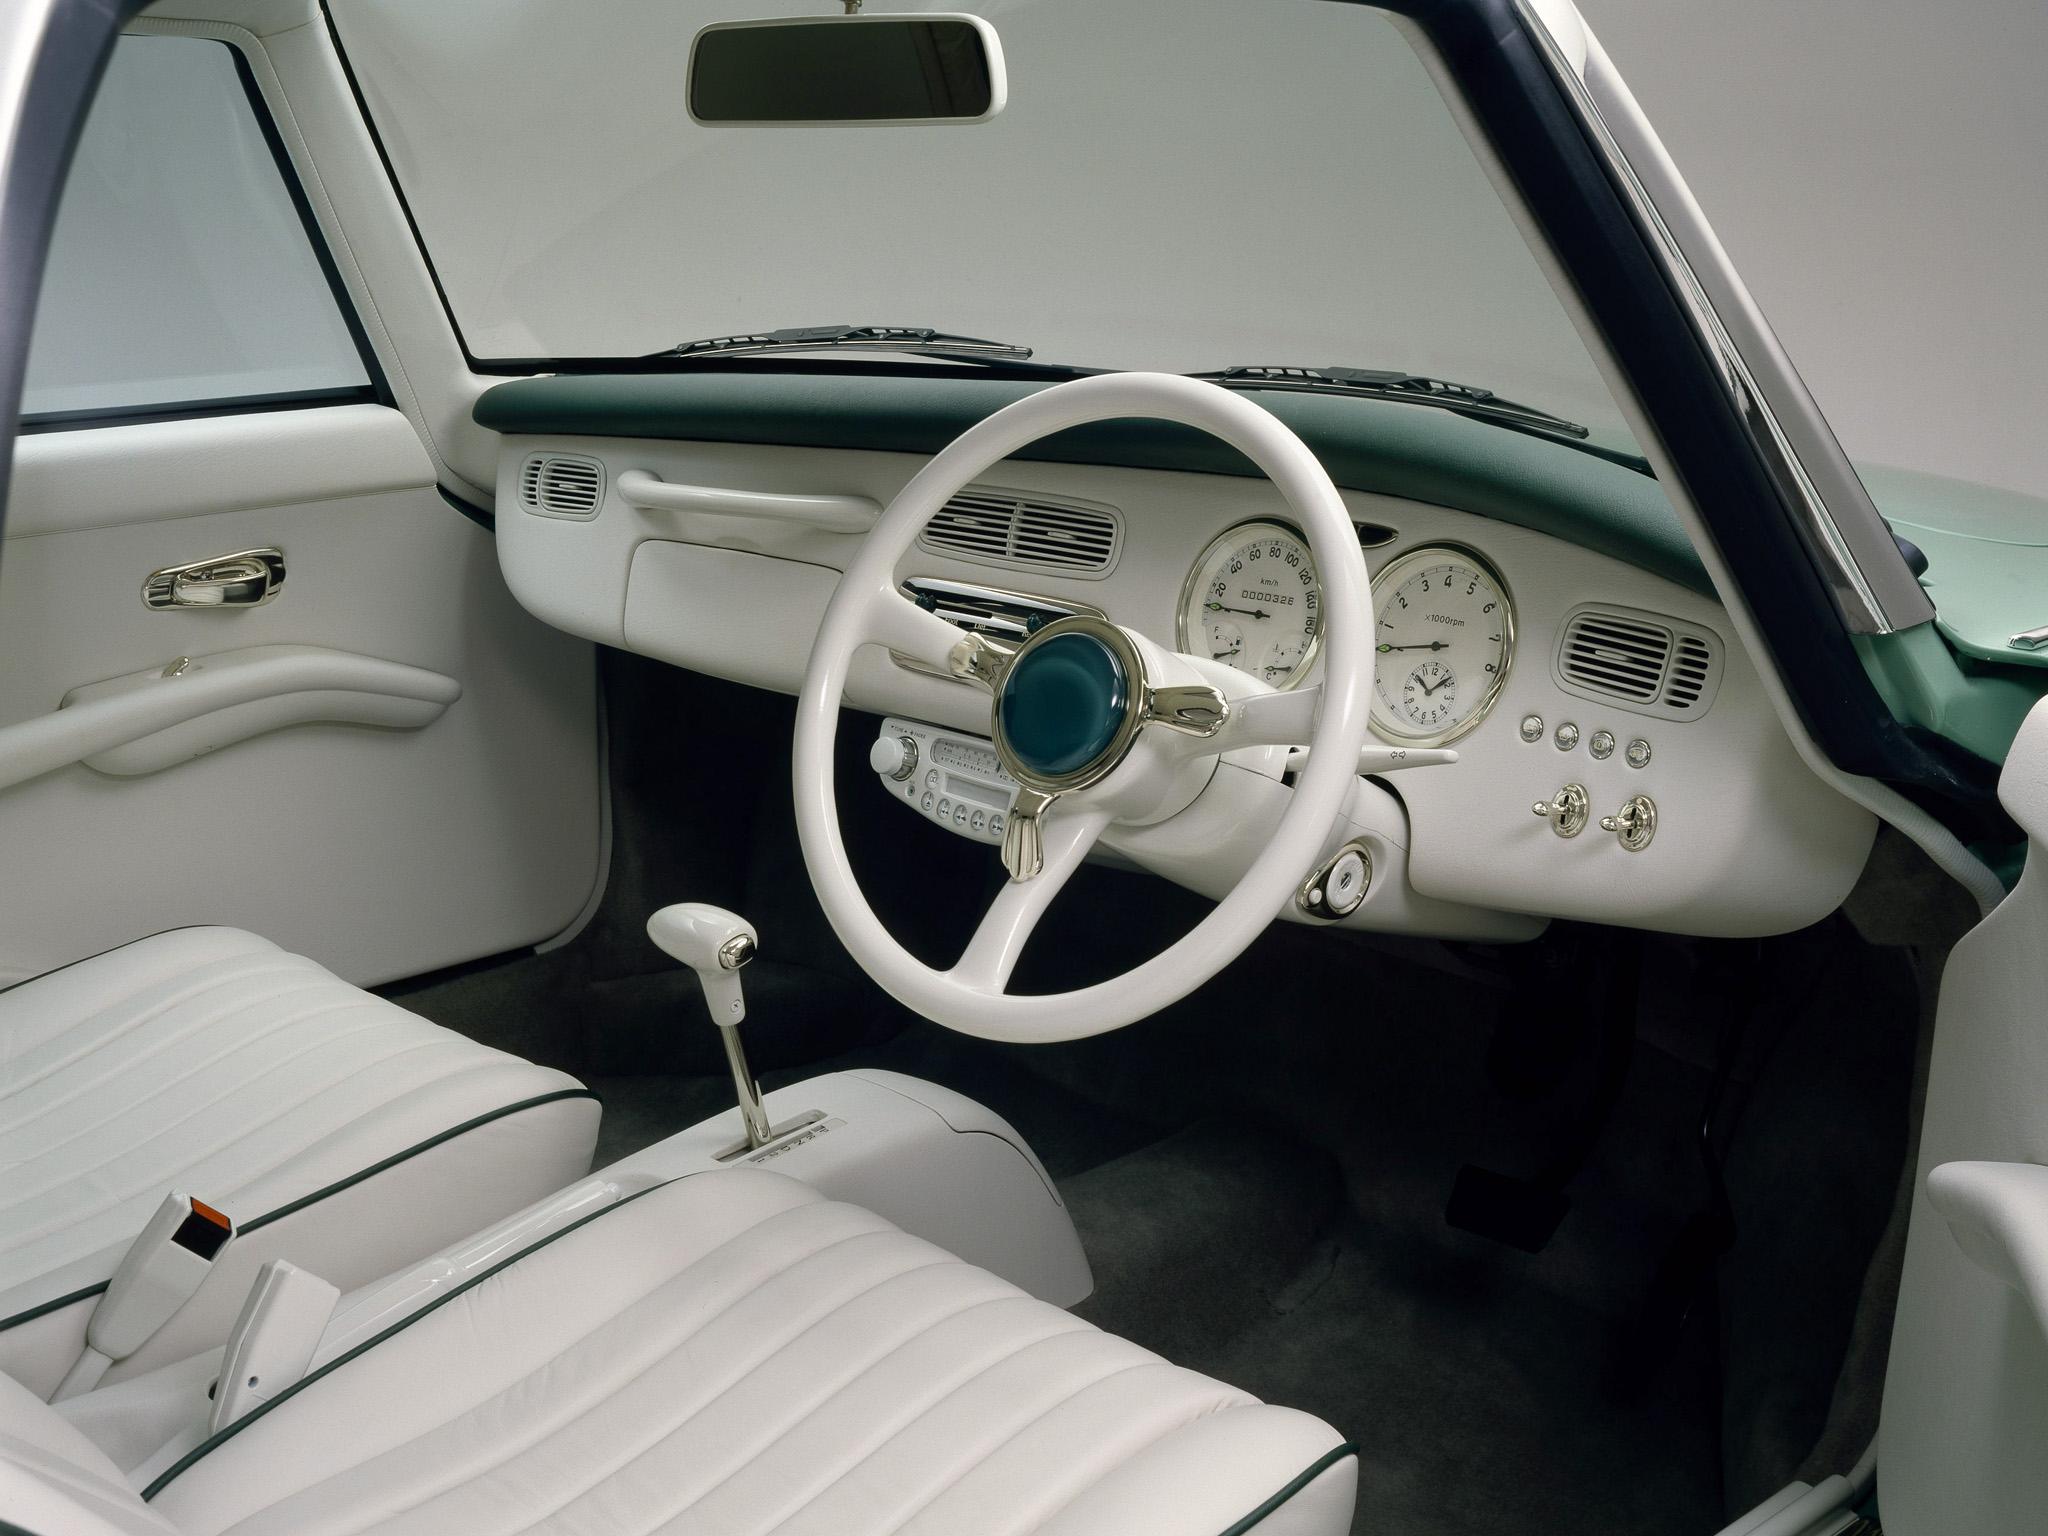 Nissan Figaro interior